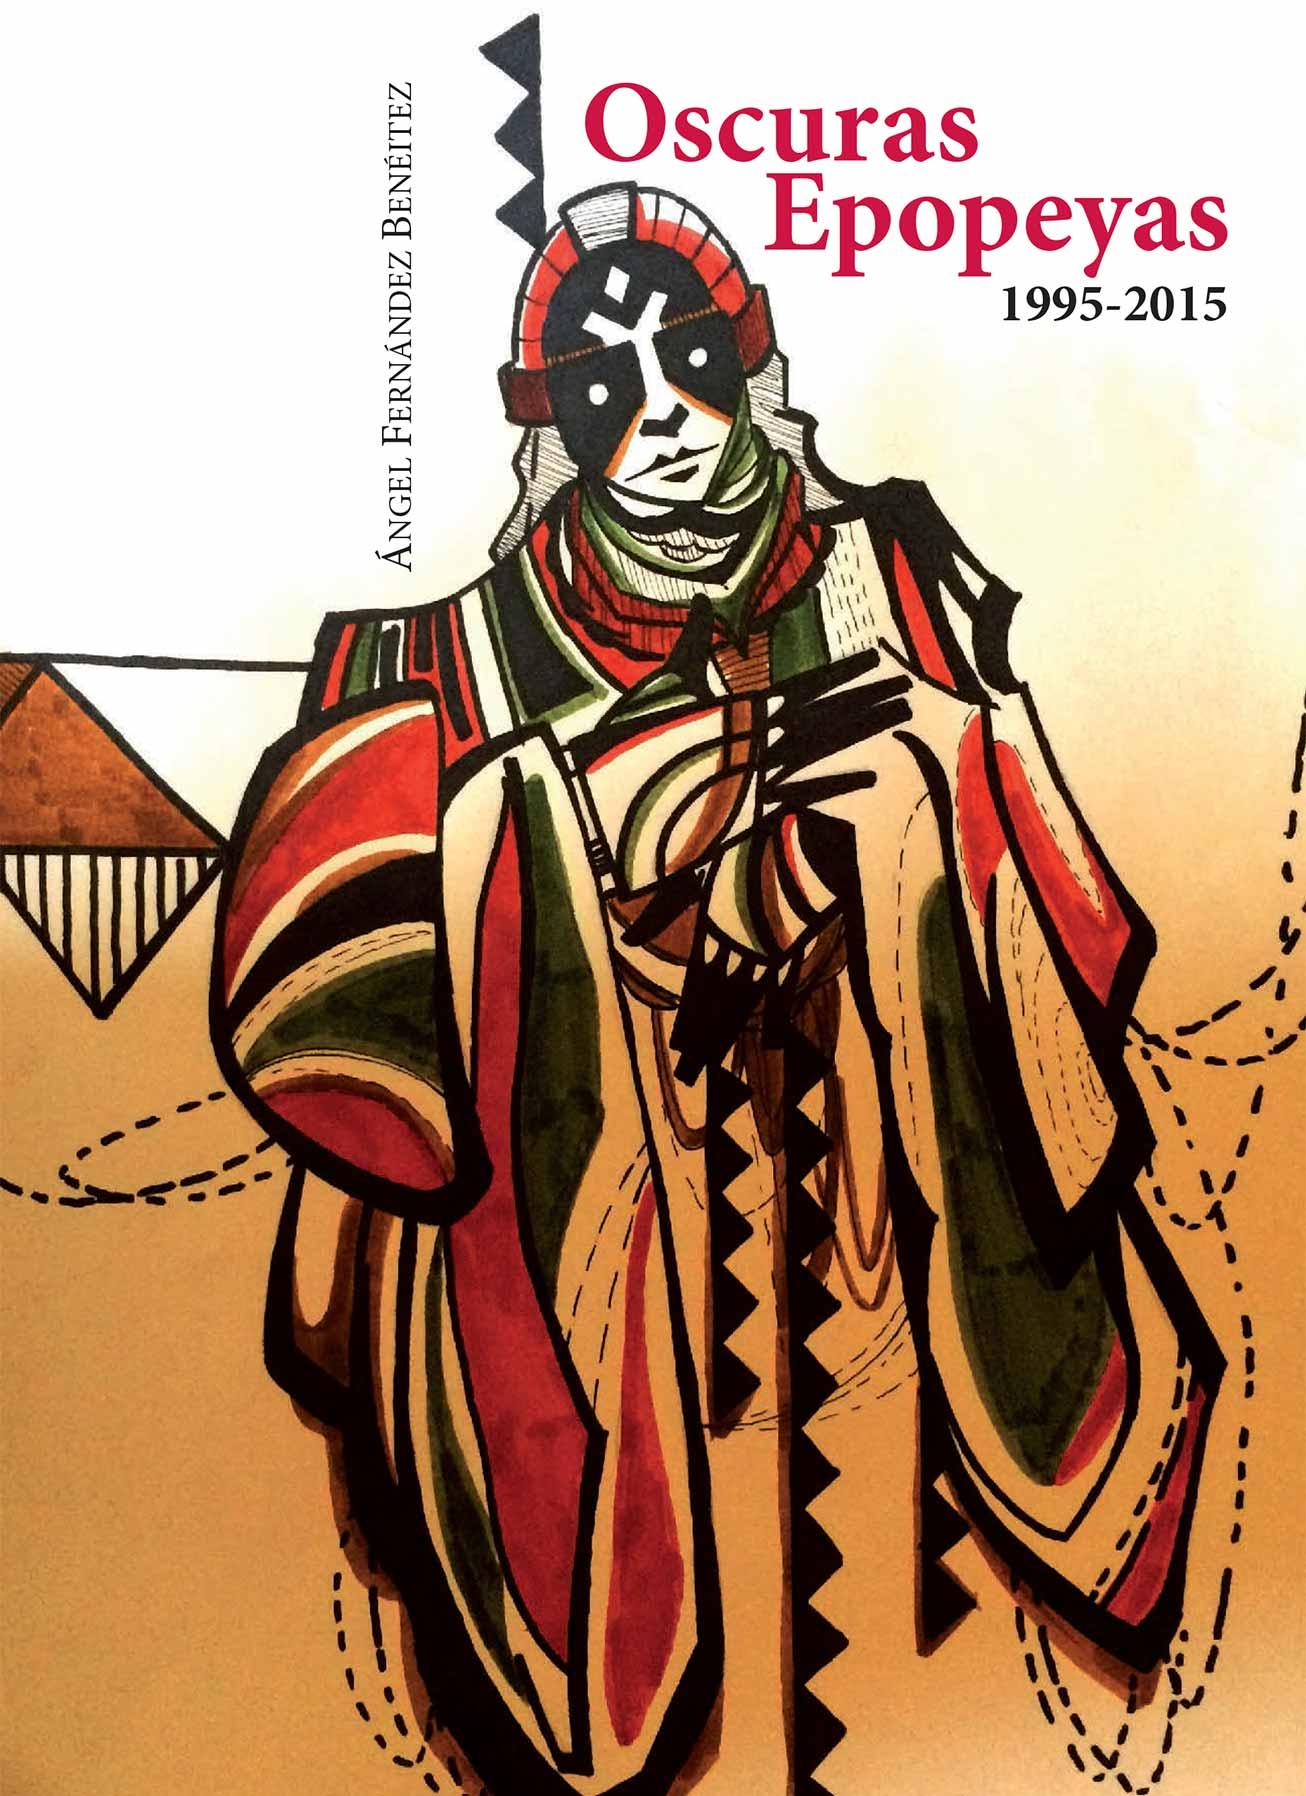 Oscuras Epopeyas 1995-2015 Ángel Fernández Benéitez librería editorial Semuret